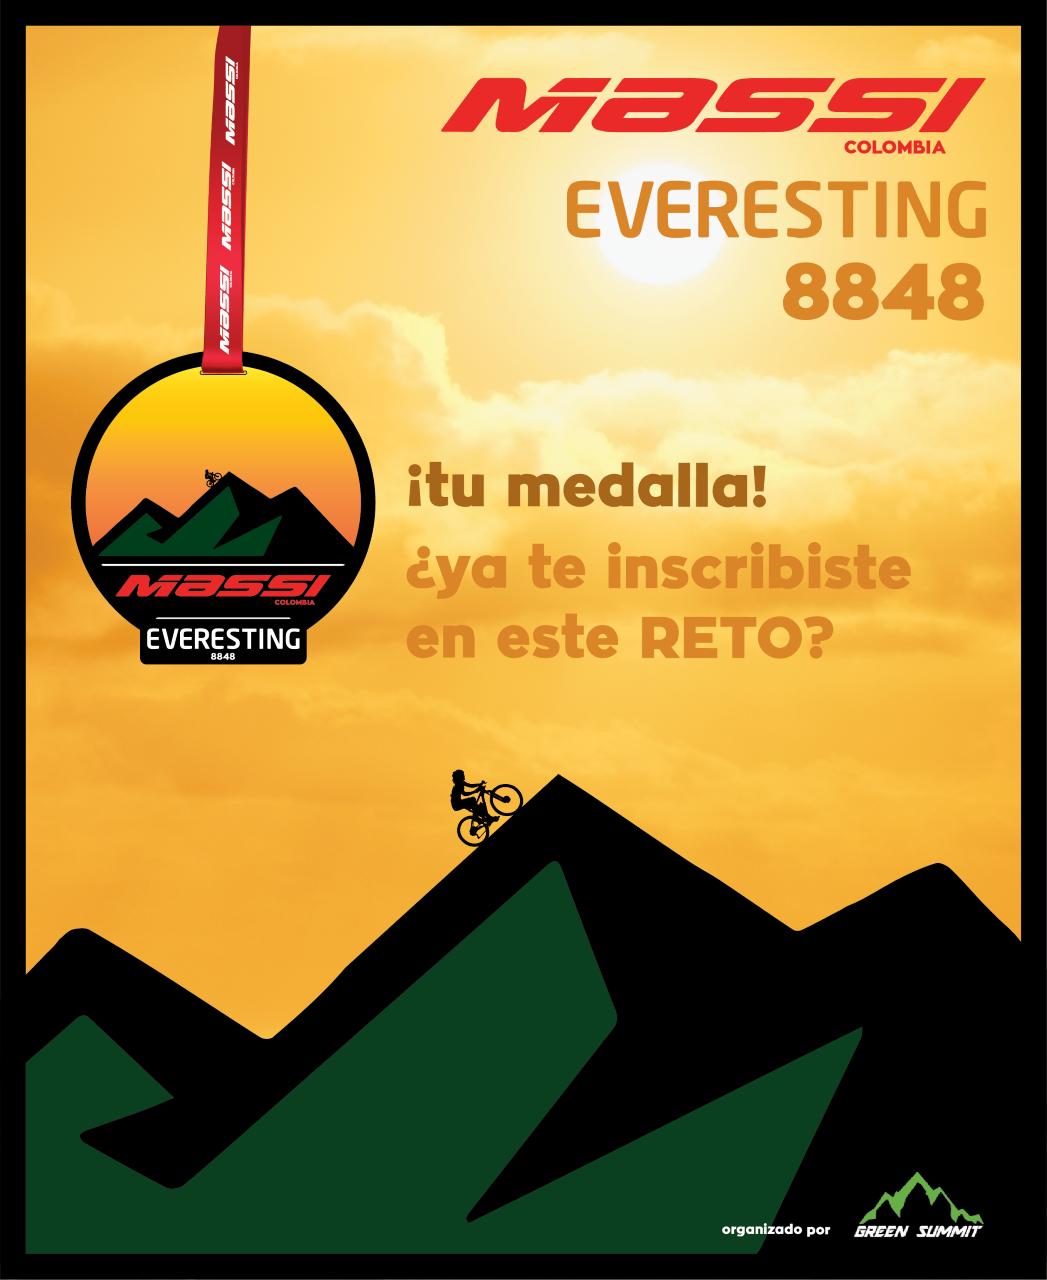 Thumbnail 4 everesting post massi colombia everesting  pieza campan%cc%83a 1